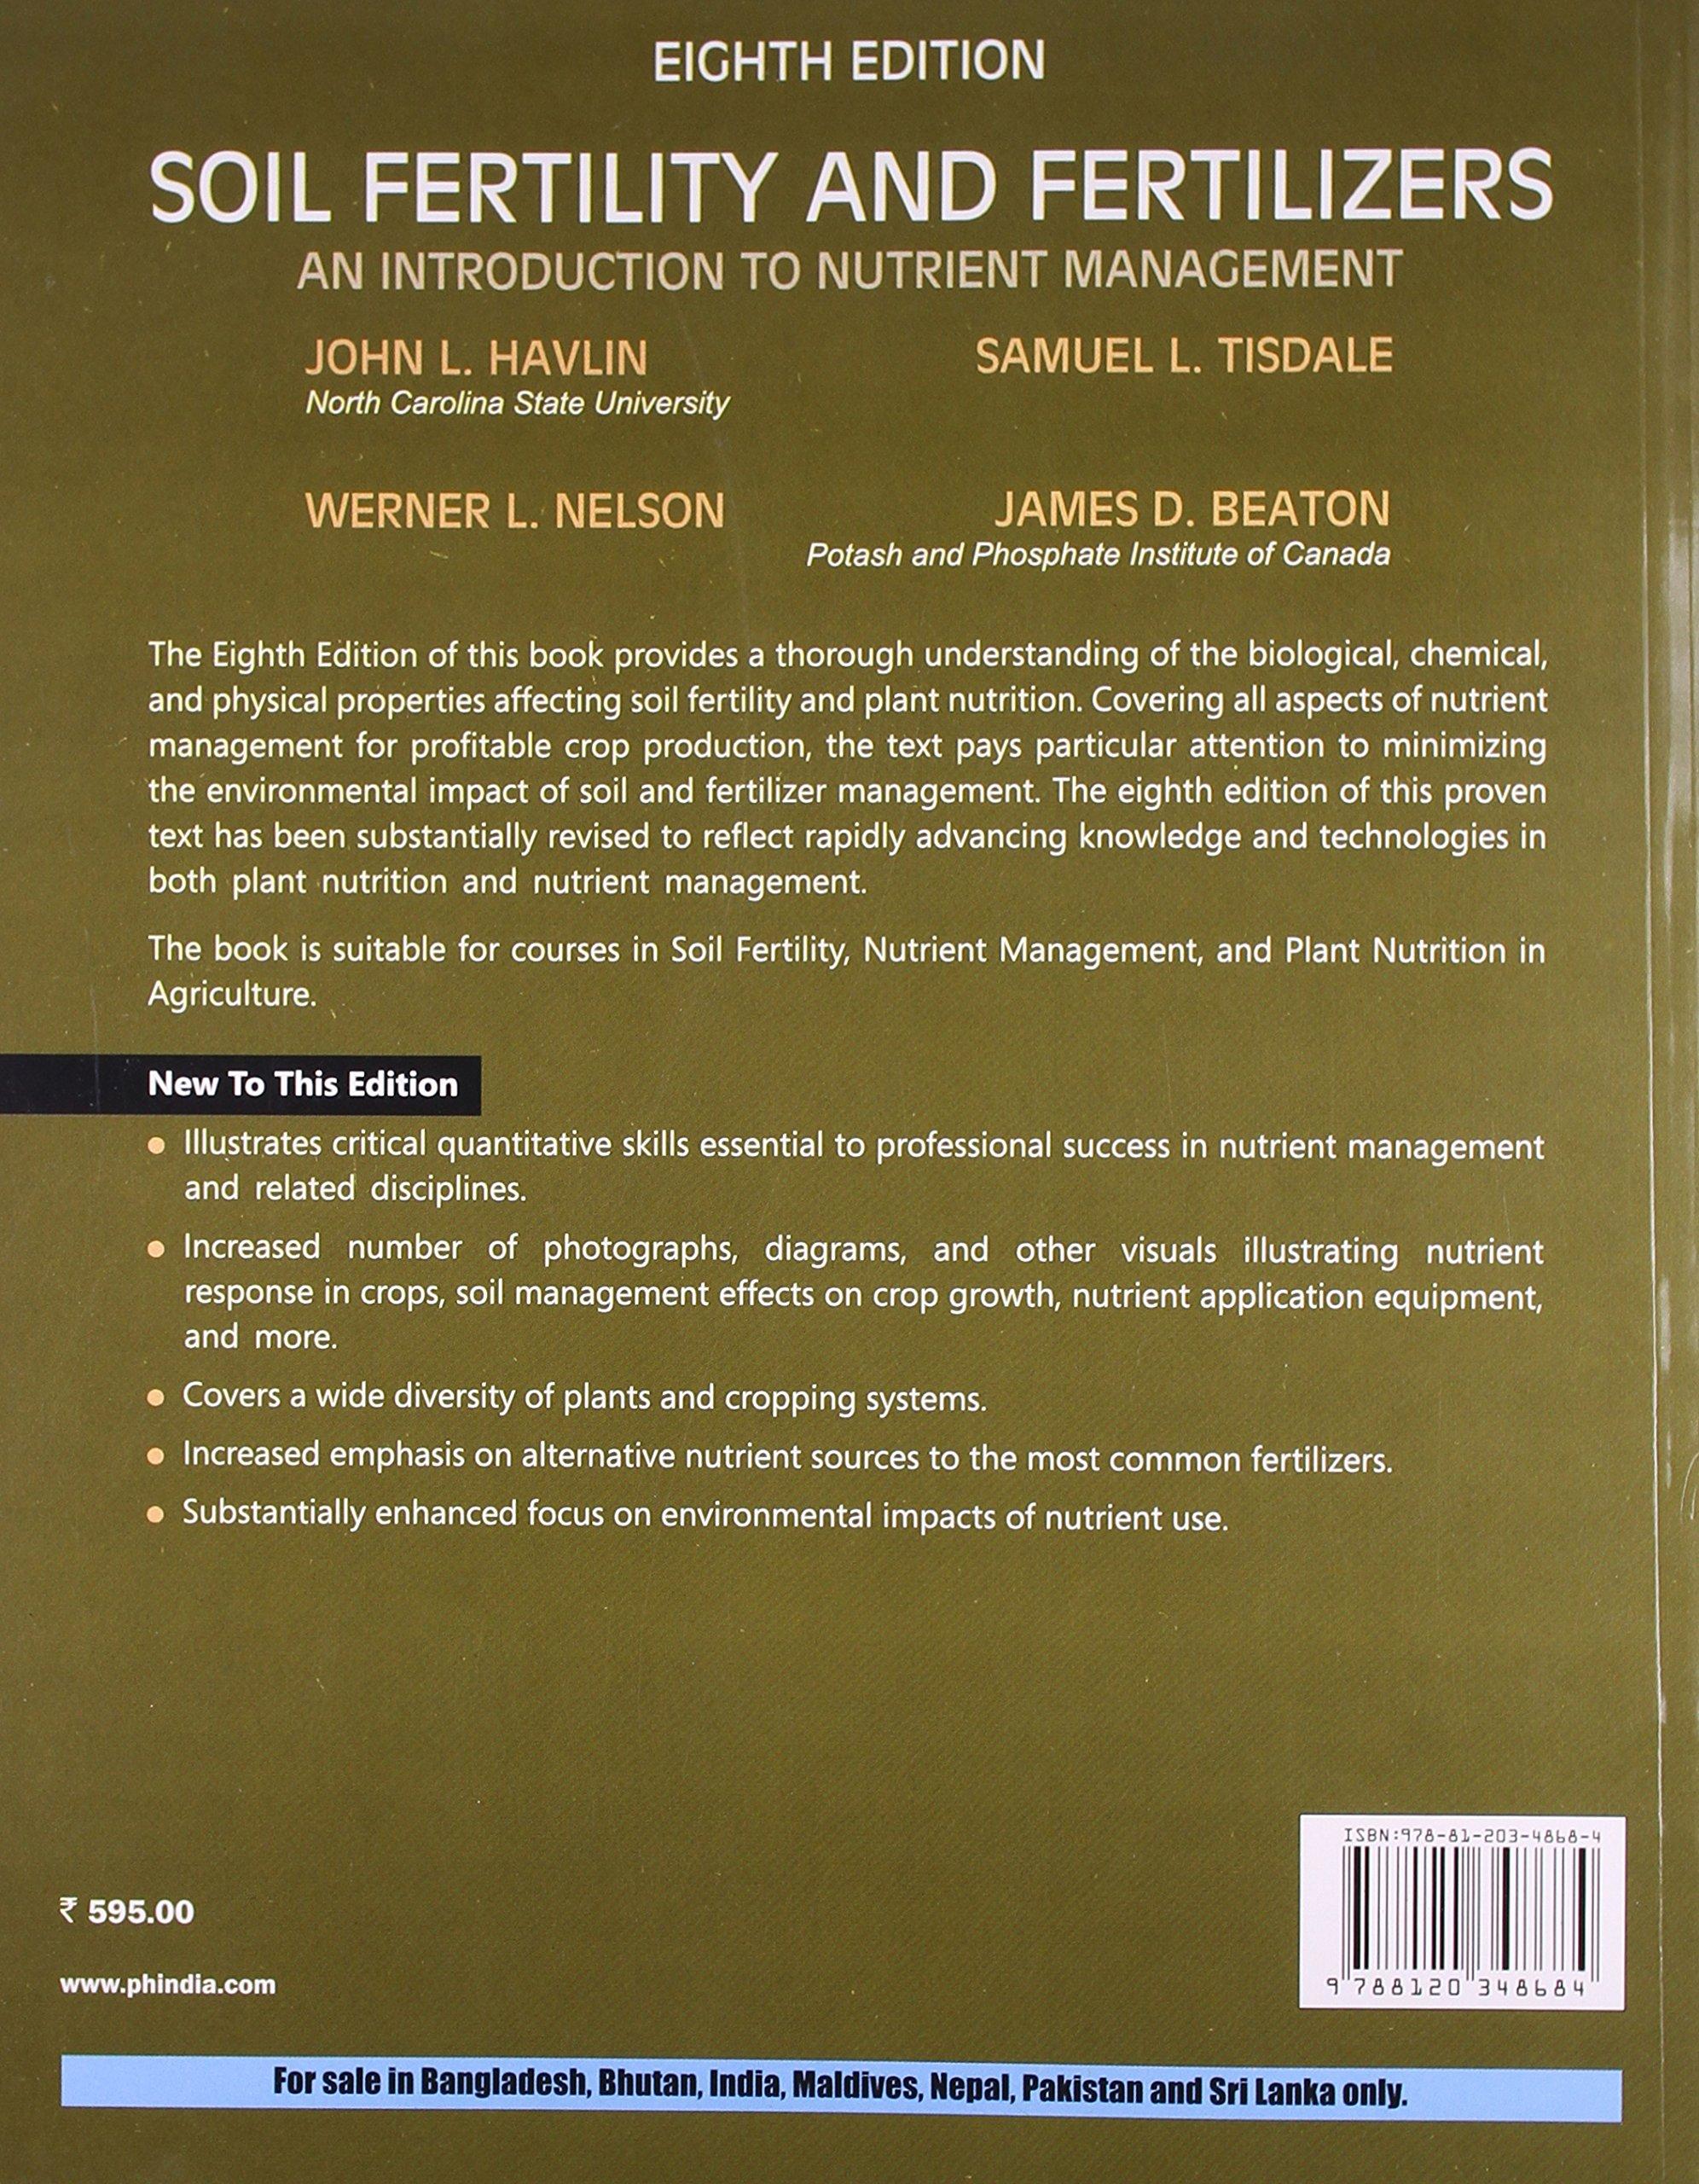 Soil Fertility and Fertilizers (8th Edition): John L Havlin: 9788120348684:  Amazon.com: Books